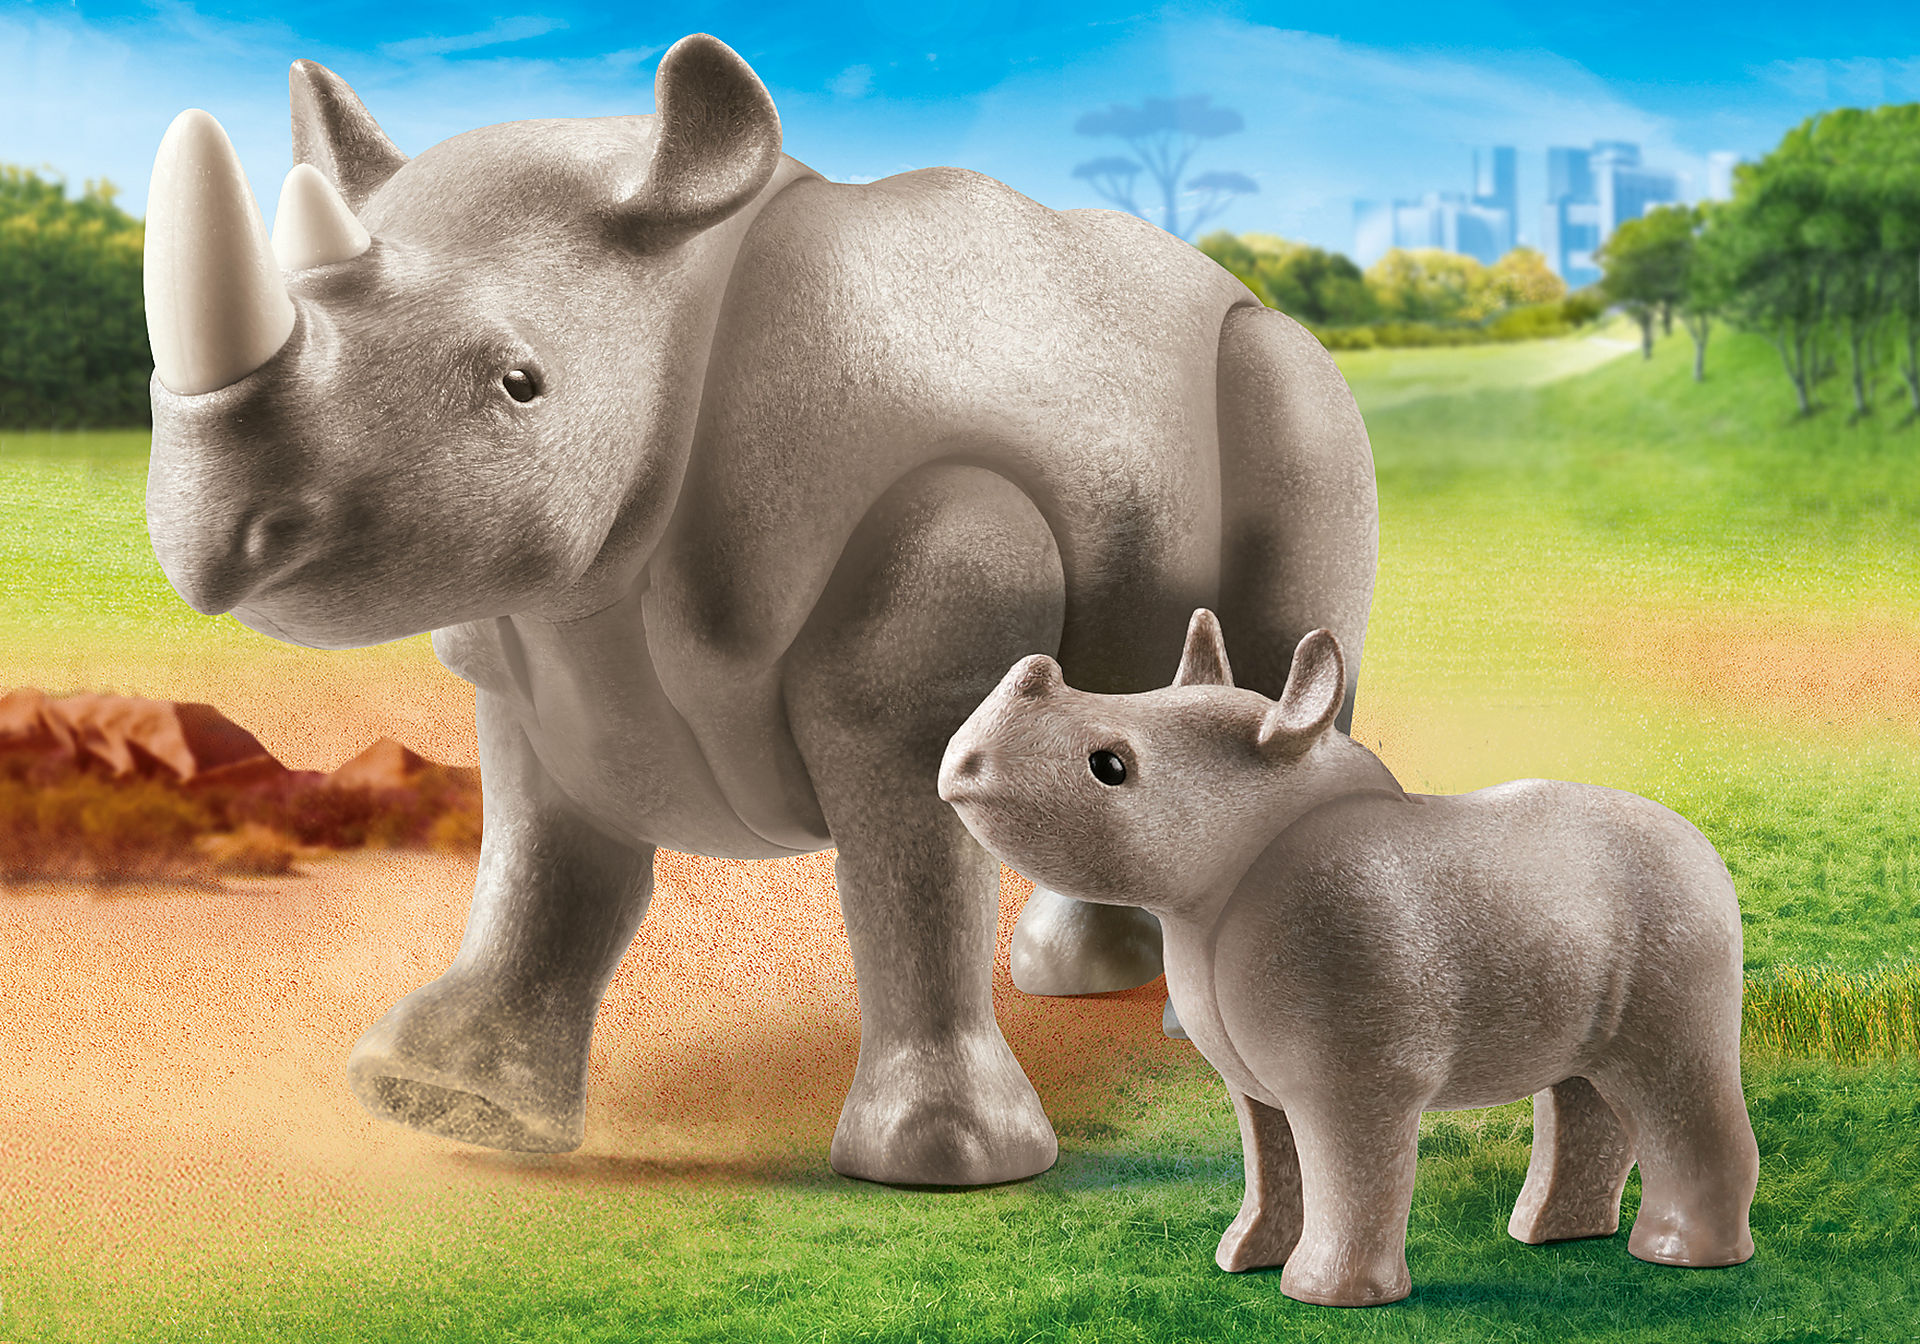 70357 Rhino with Calf zoom image1